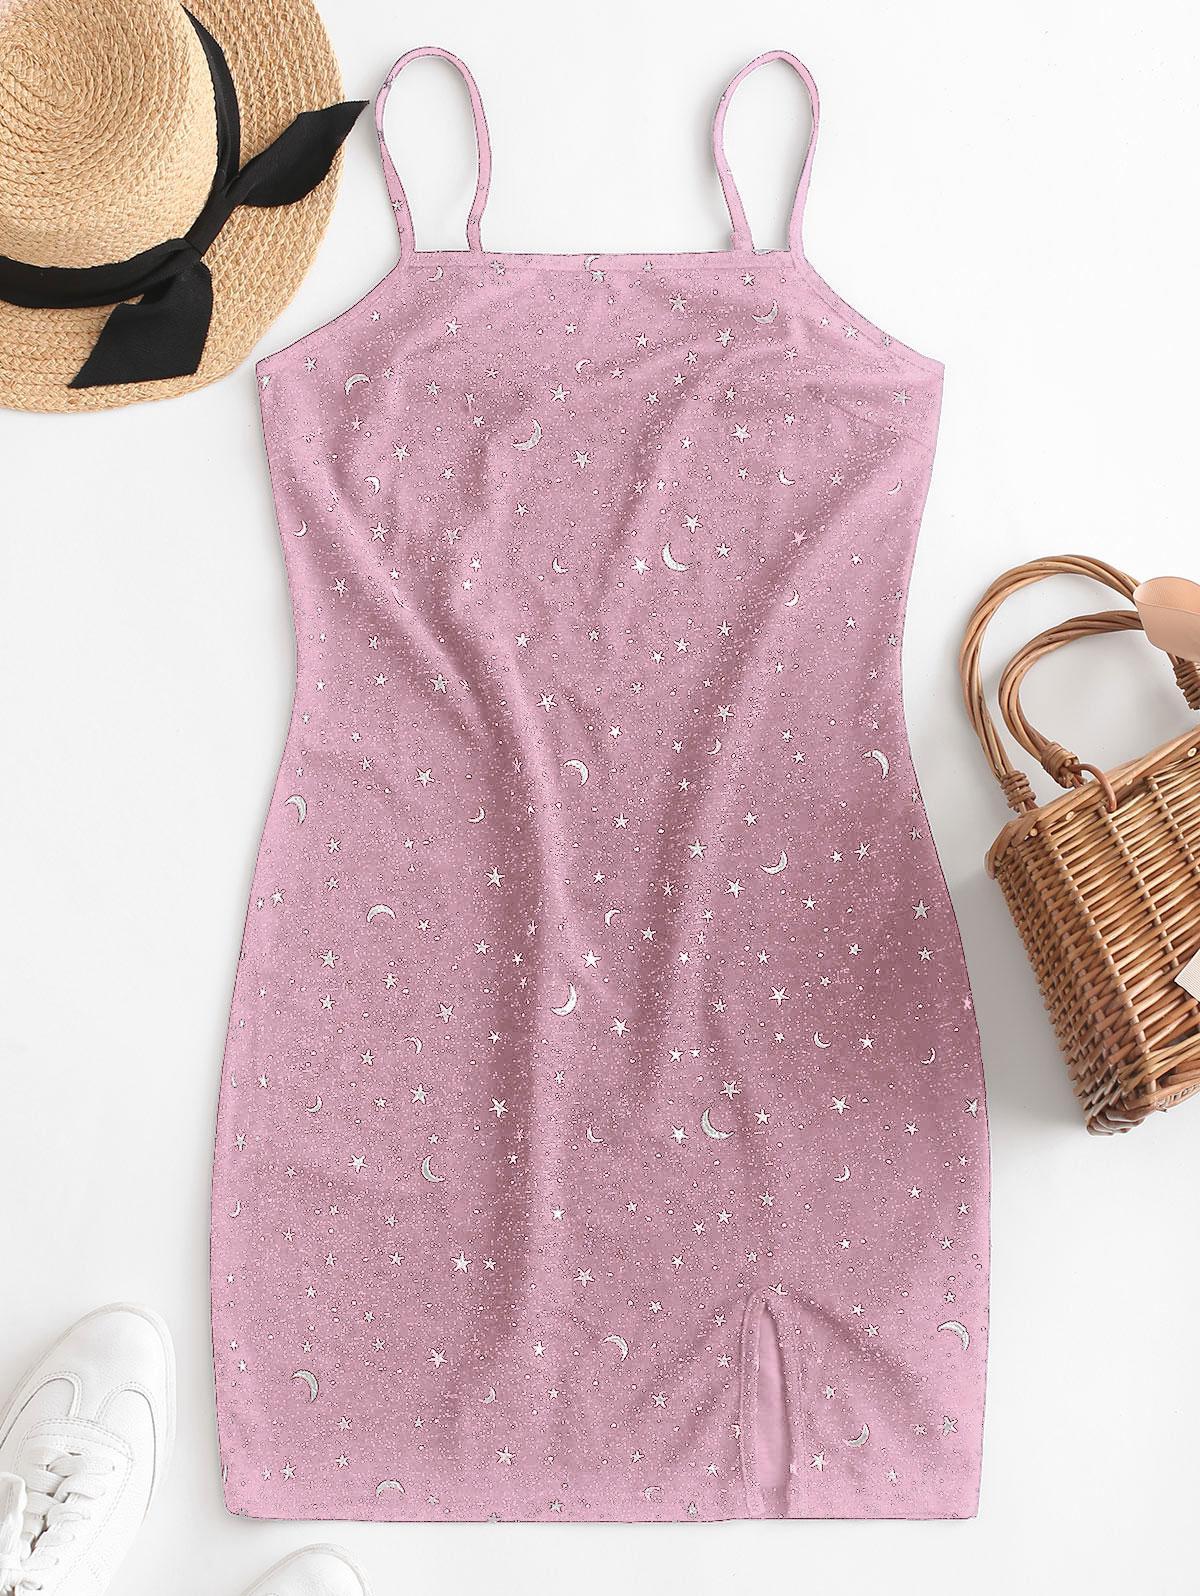 ZAFUL Moon and Star Metallic Thread Cami Slit Dress, Lipstick pink